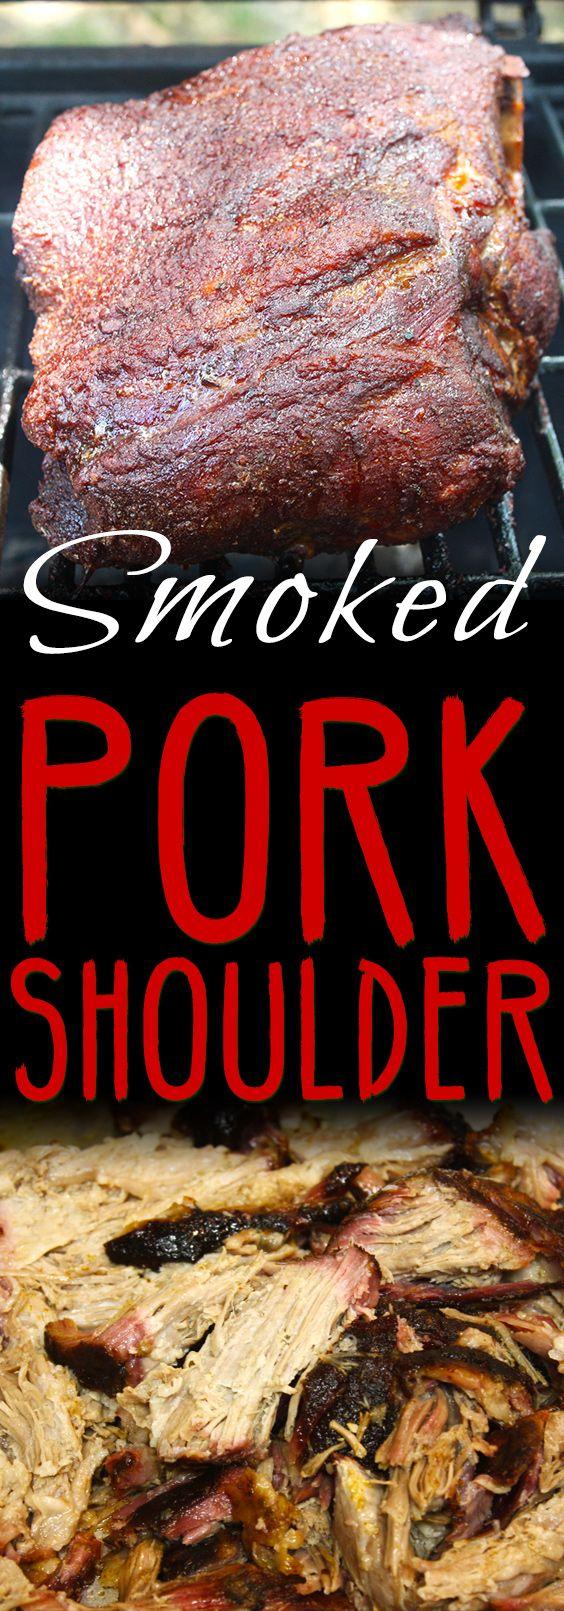 pork shoulder smoked BBQ and Smoker Project Idea www.MaritimeVintage.com